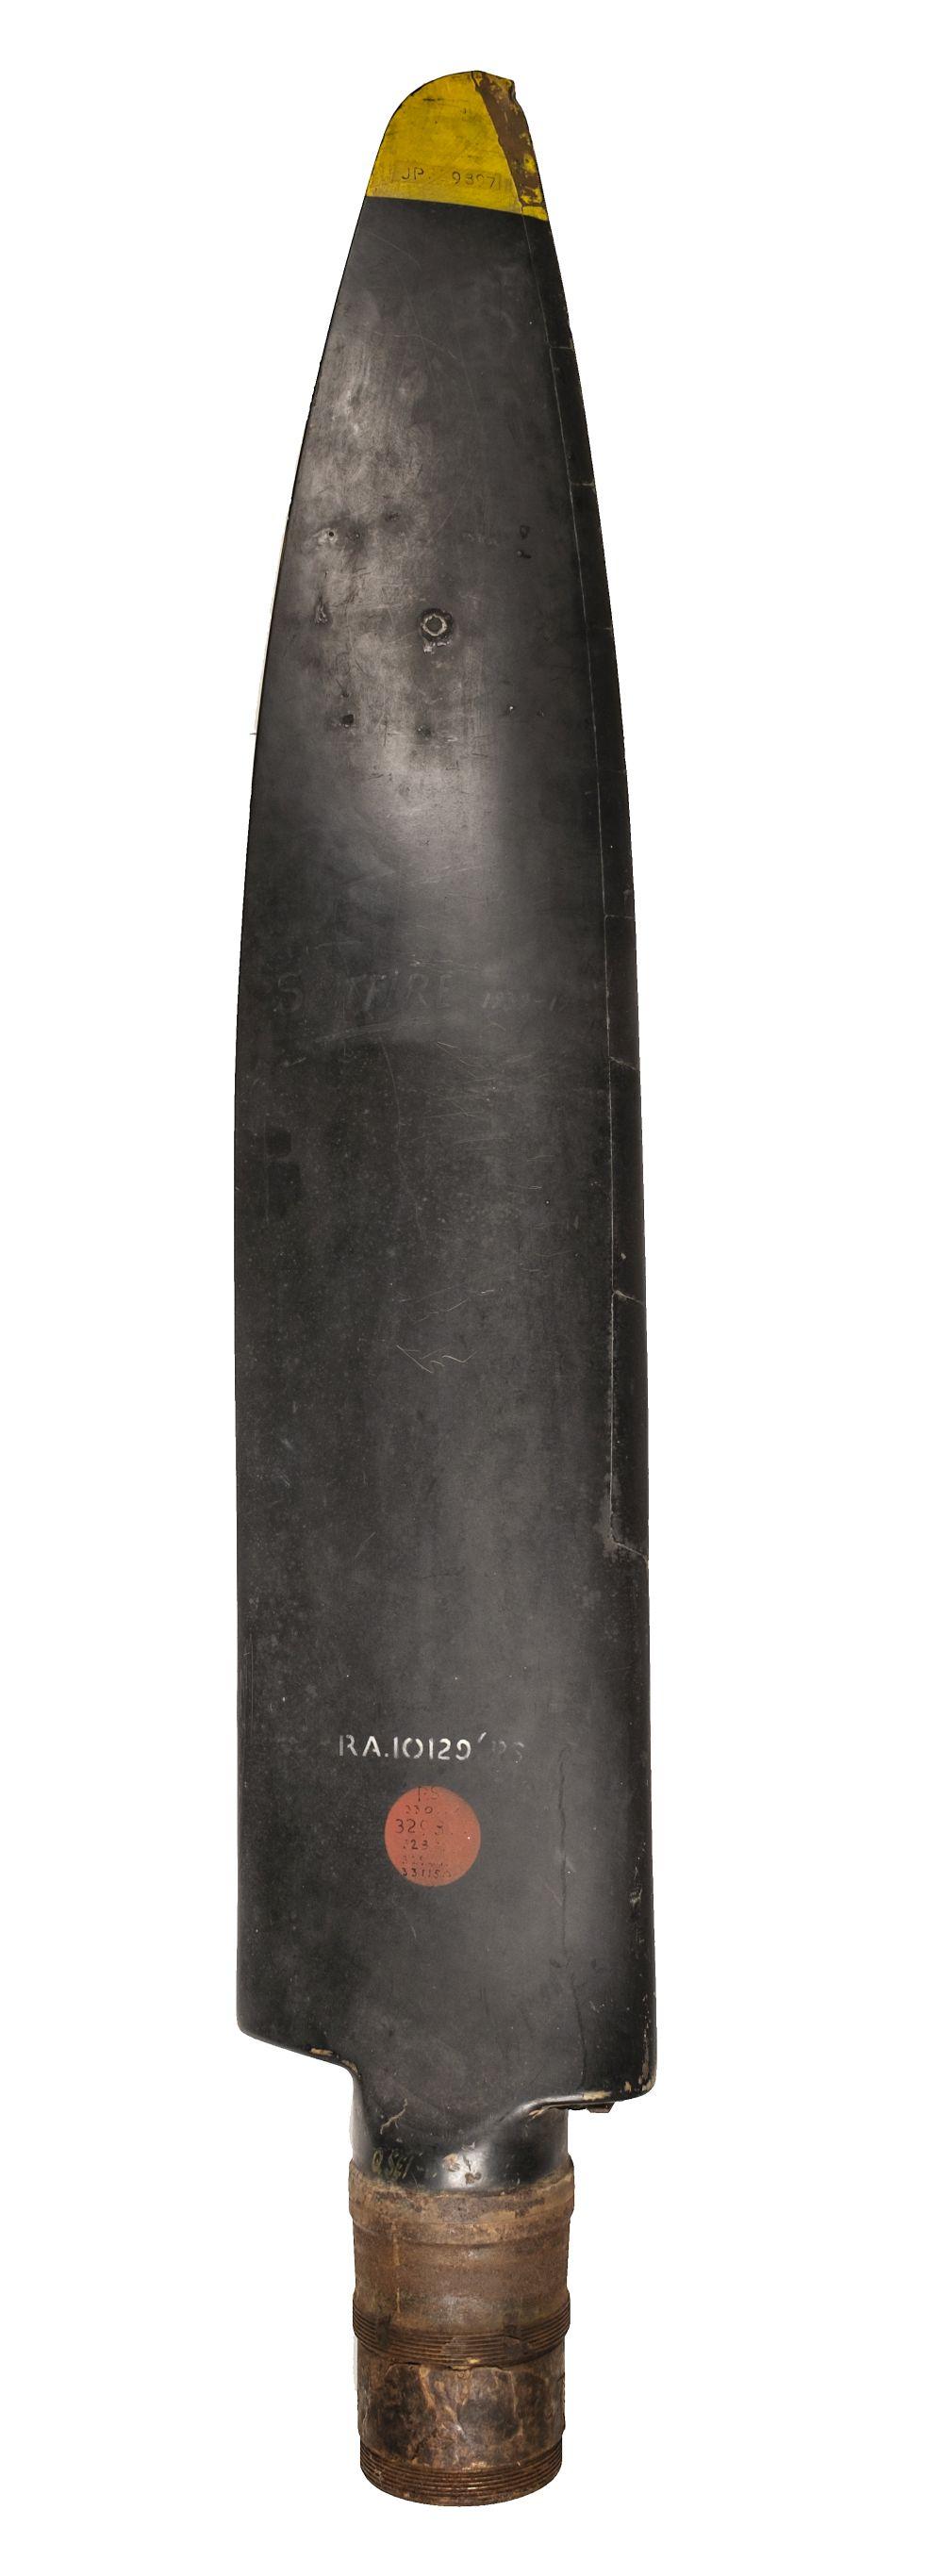 * Propeller. WWII Rotol Spitfire Blade